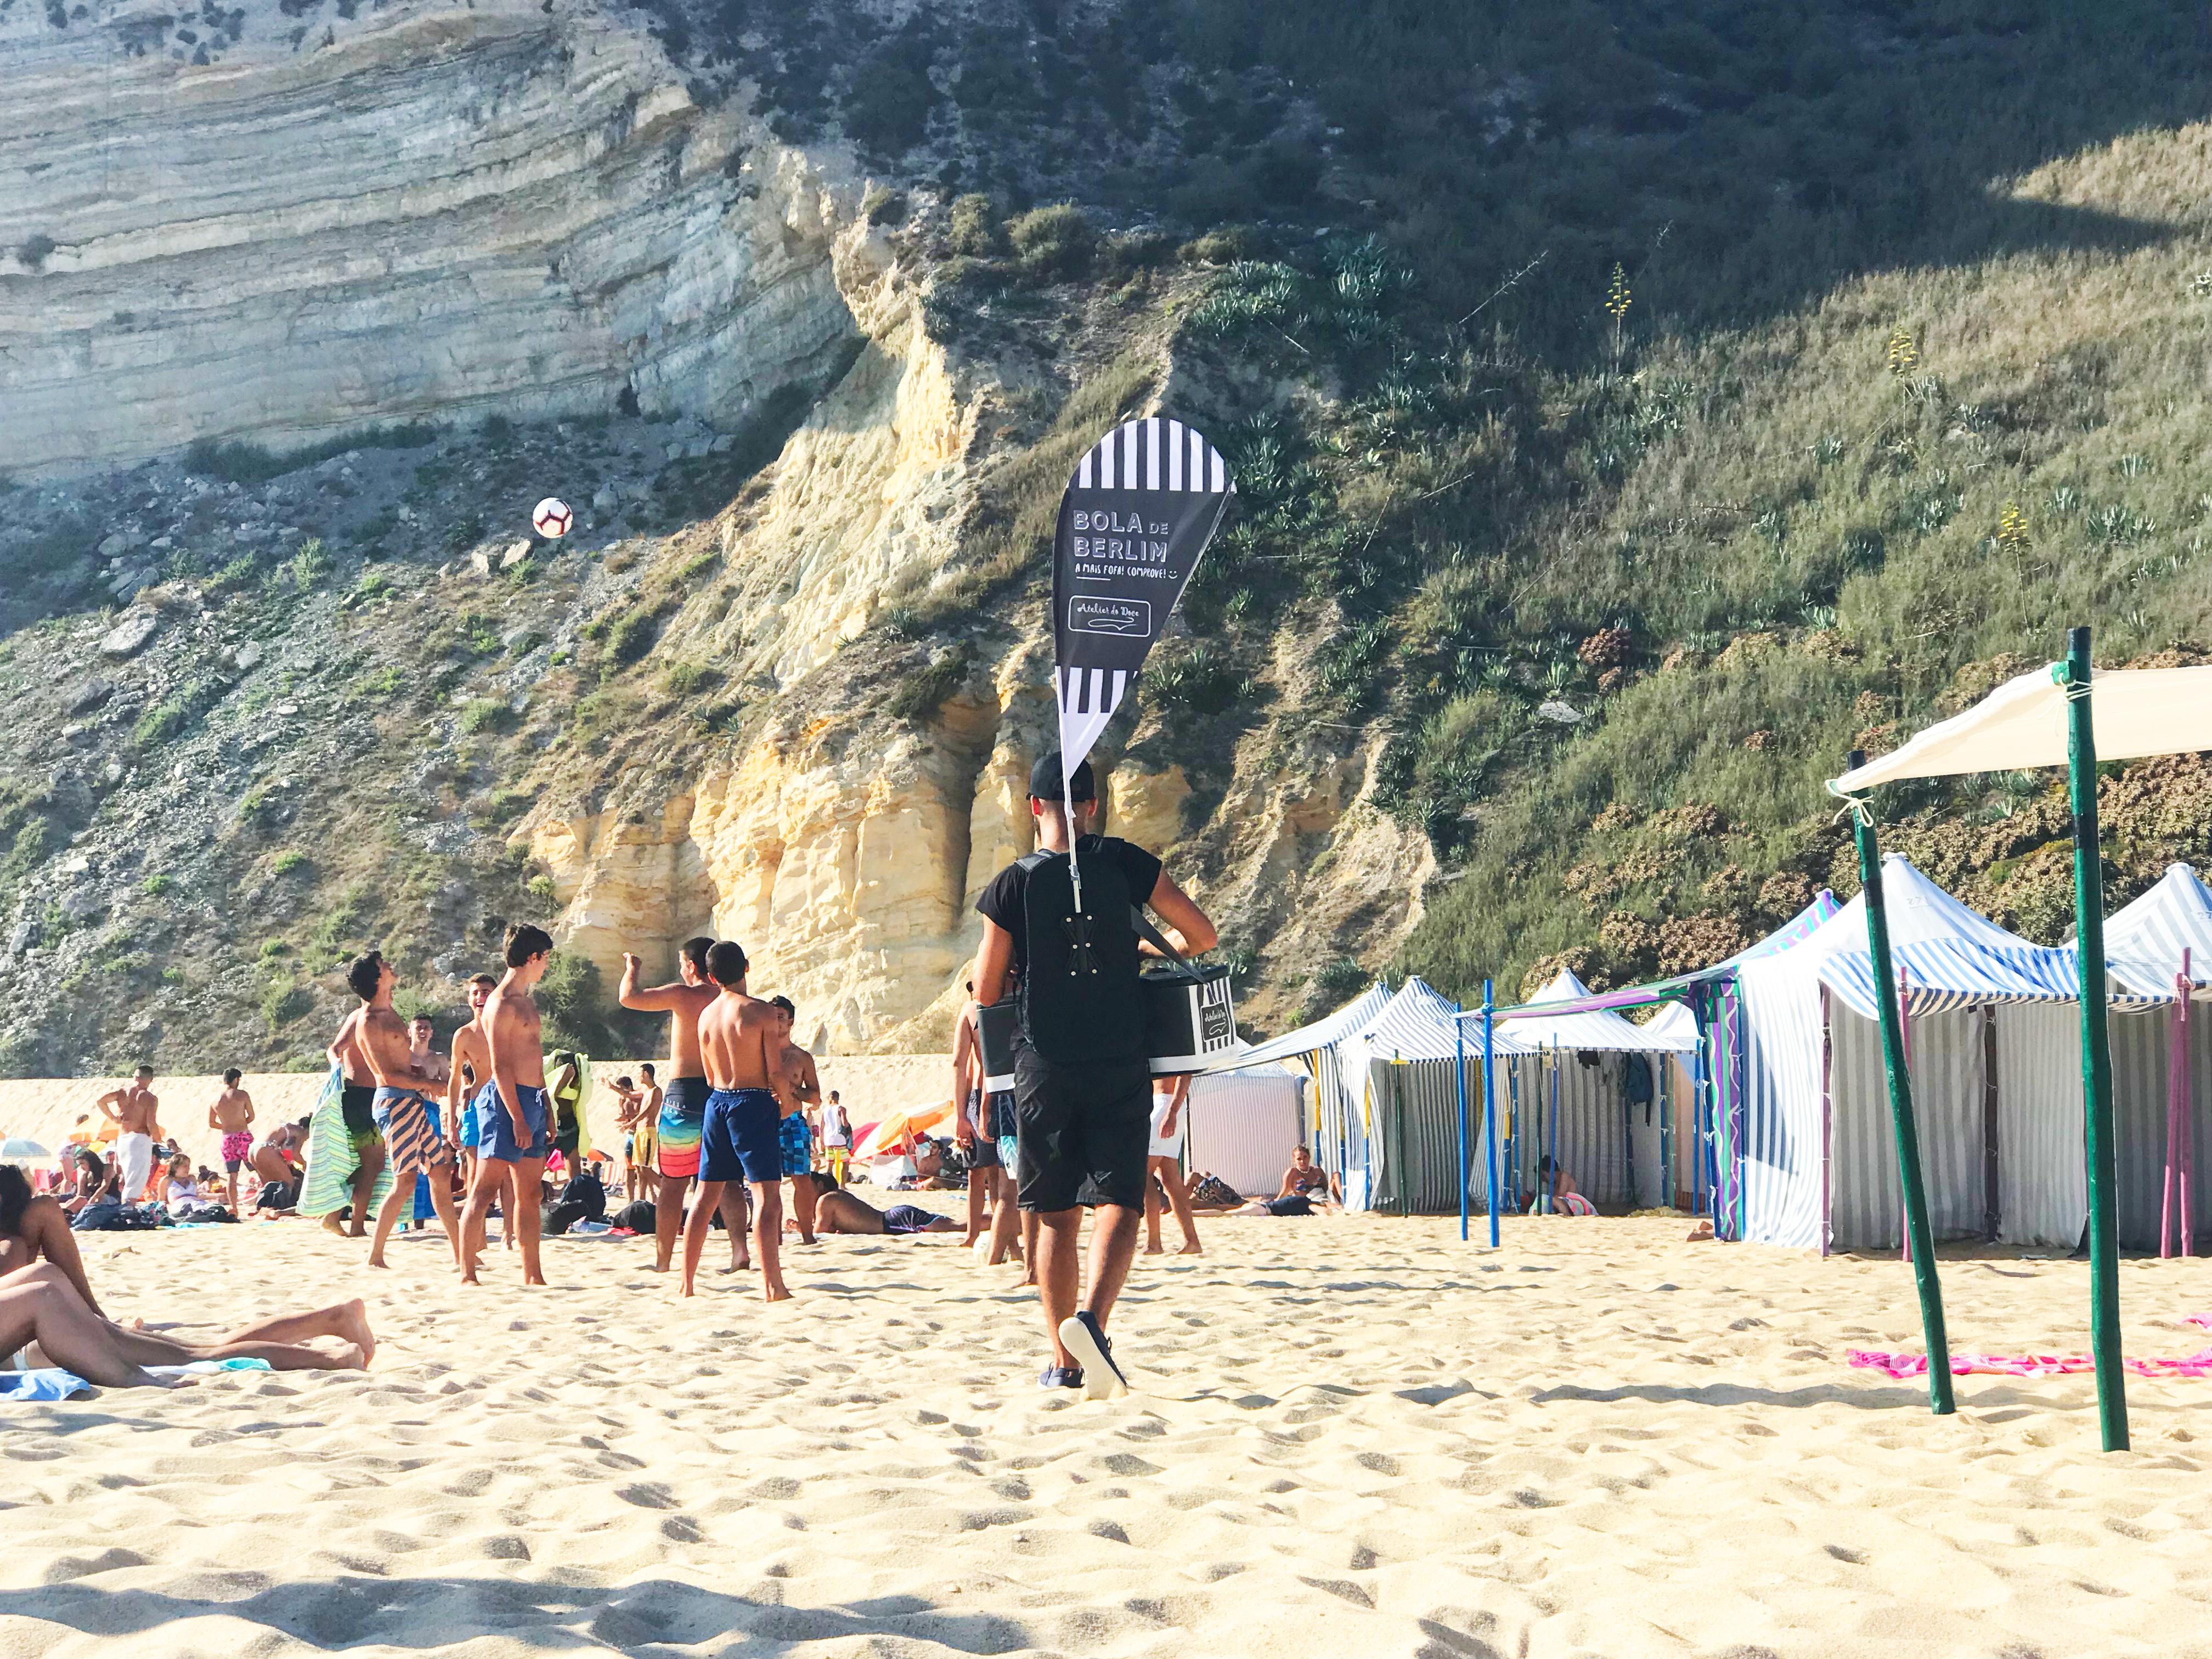 venda-ambulante-bola-berlim-praia-atelier-do-doce-alfeizerao-pastelaria-doces-conventuais